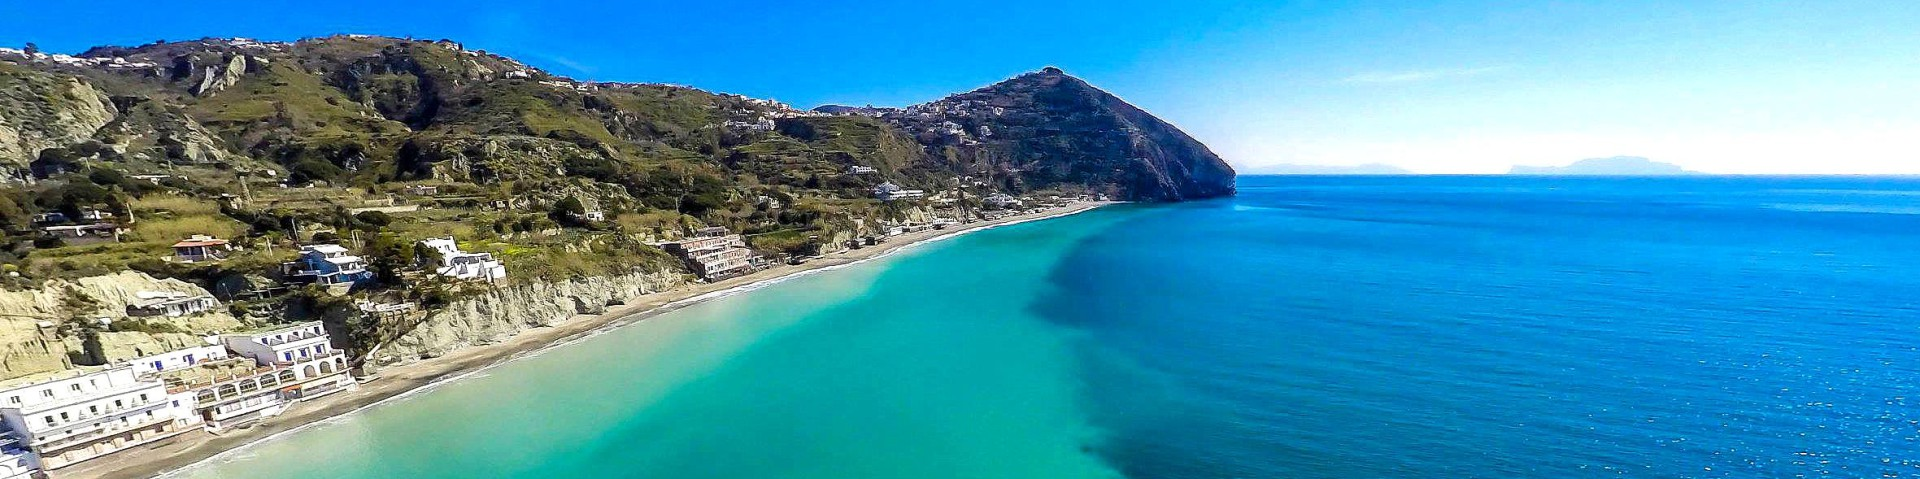 Barano, pláž zvaná Maronti (autor: Luigi Conte)